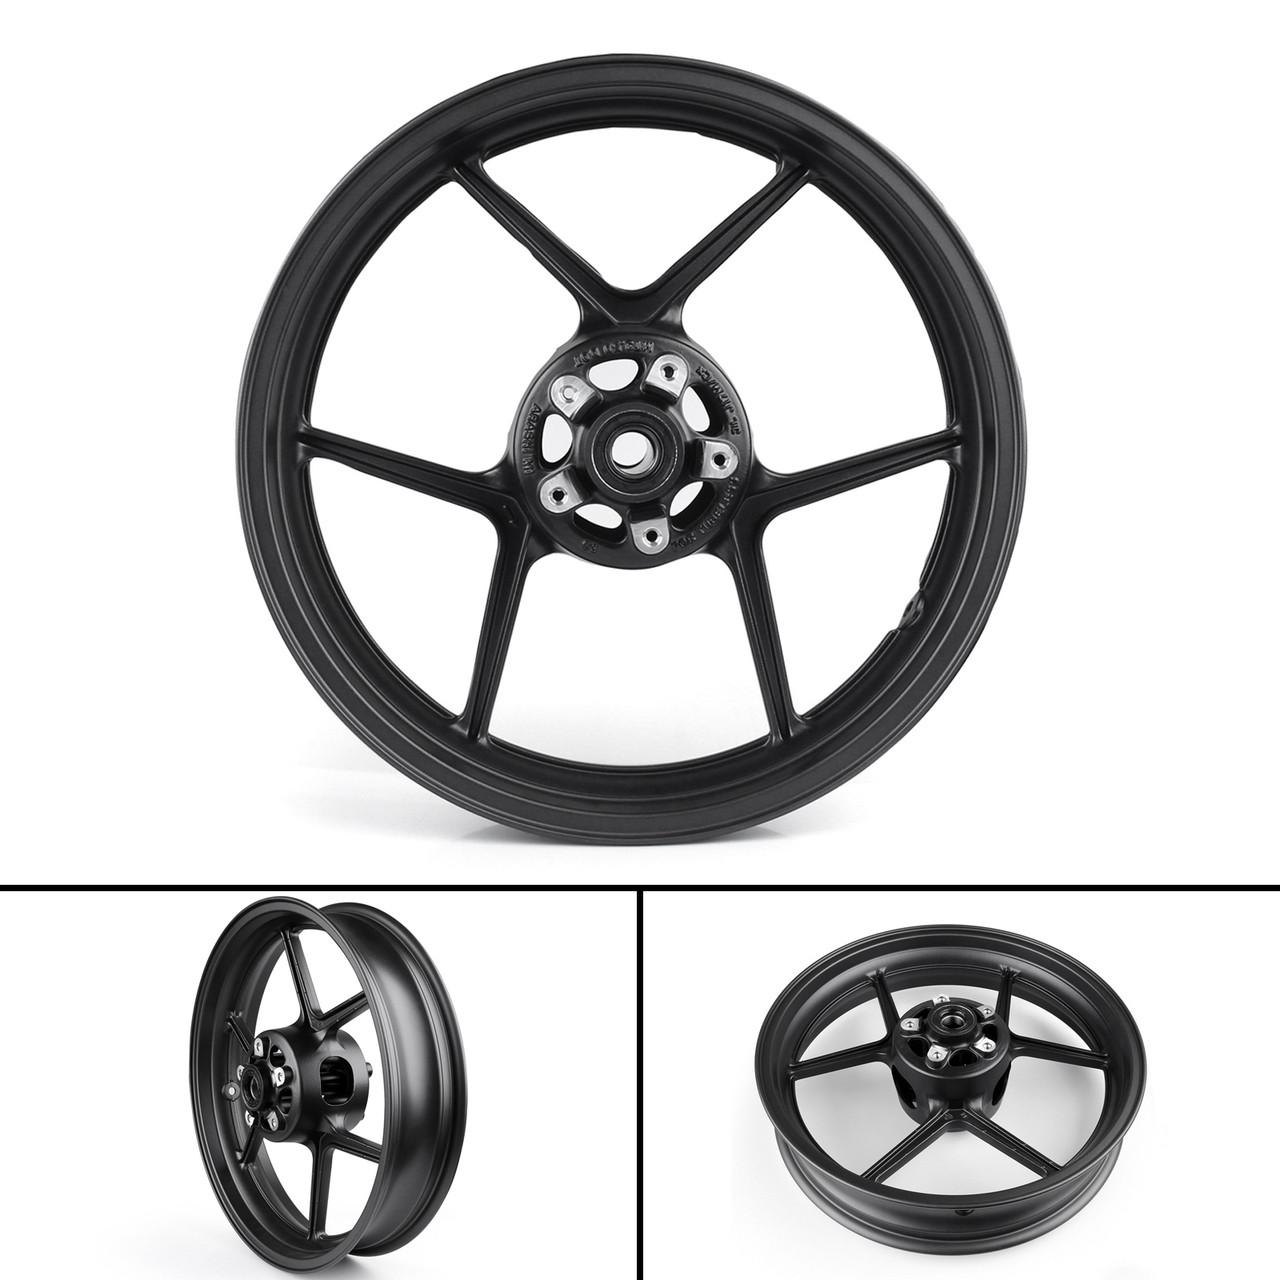 medium resolution of front wheel rim for kawasaki ninja zx6r 2005 2012 zx10r 2006 2010 z750 2007